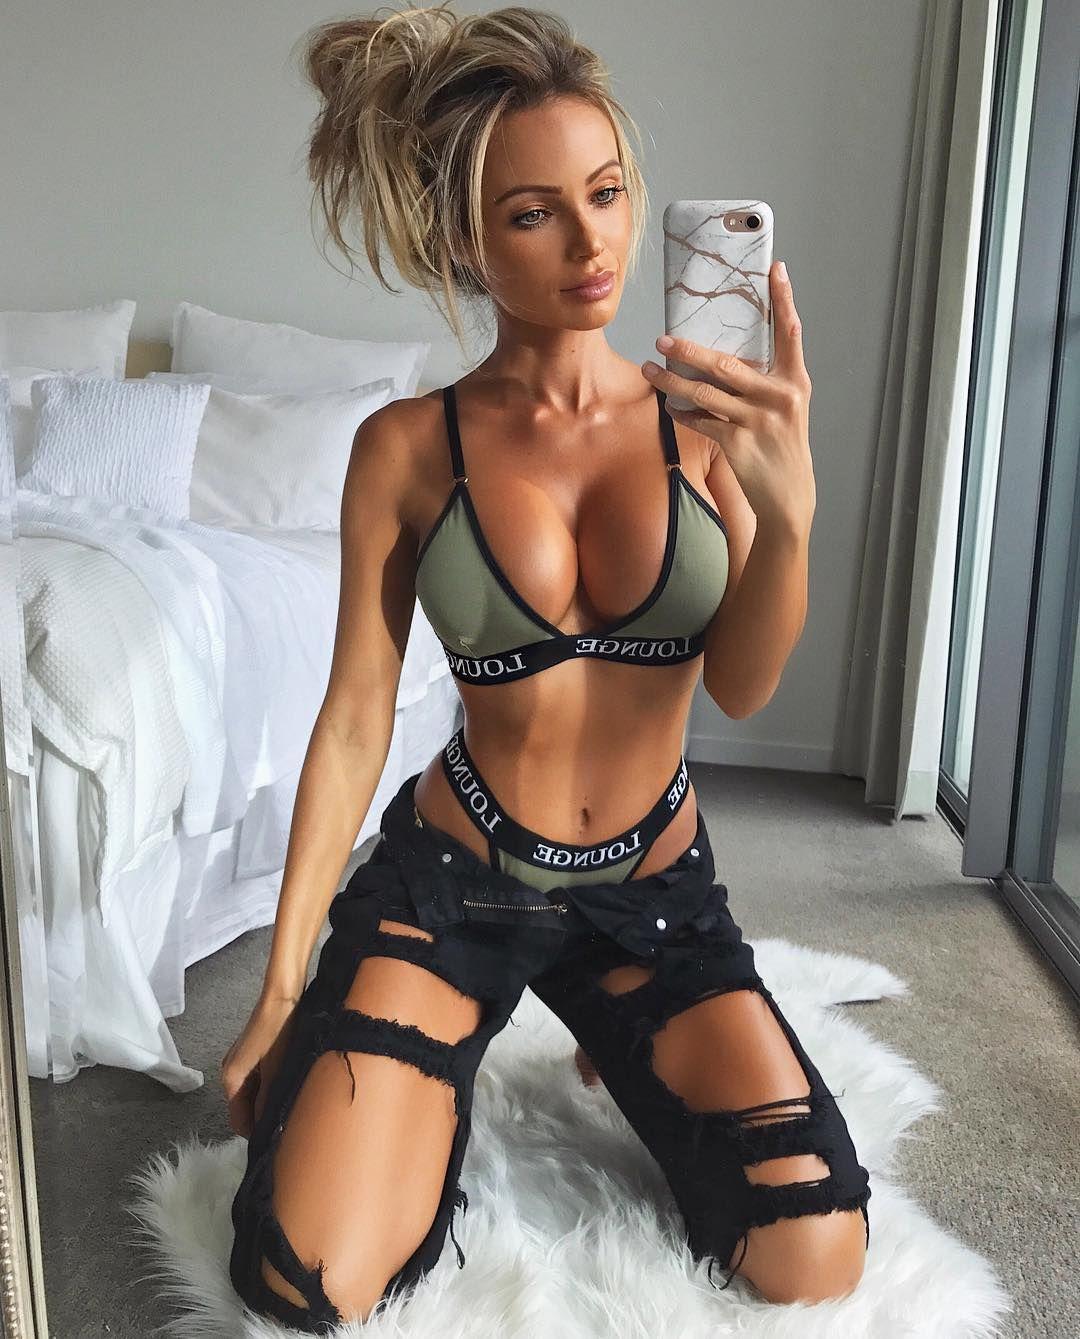 Instagram Abby Dowse nudes (23 photos), Sexy, Leaked, Boobs, in bikini 2018